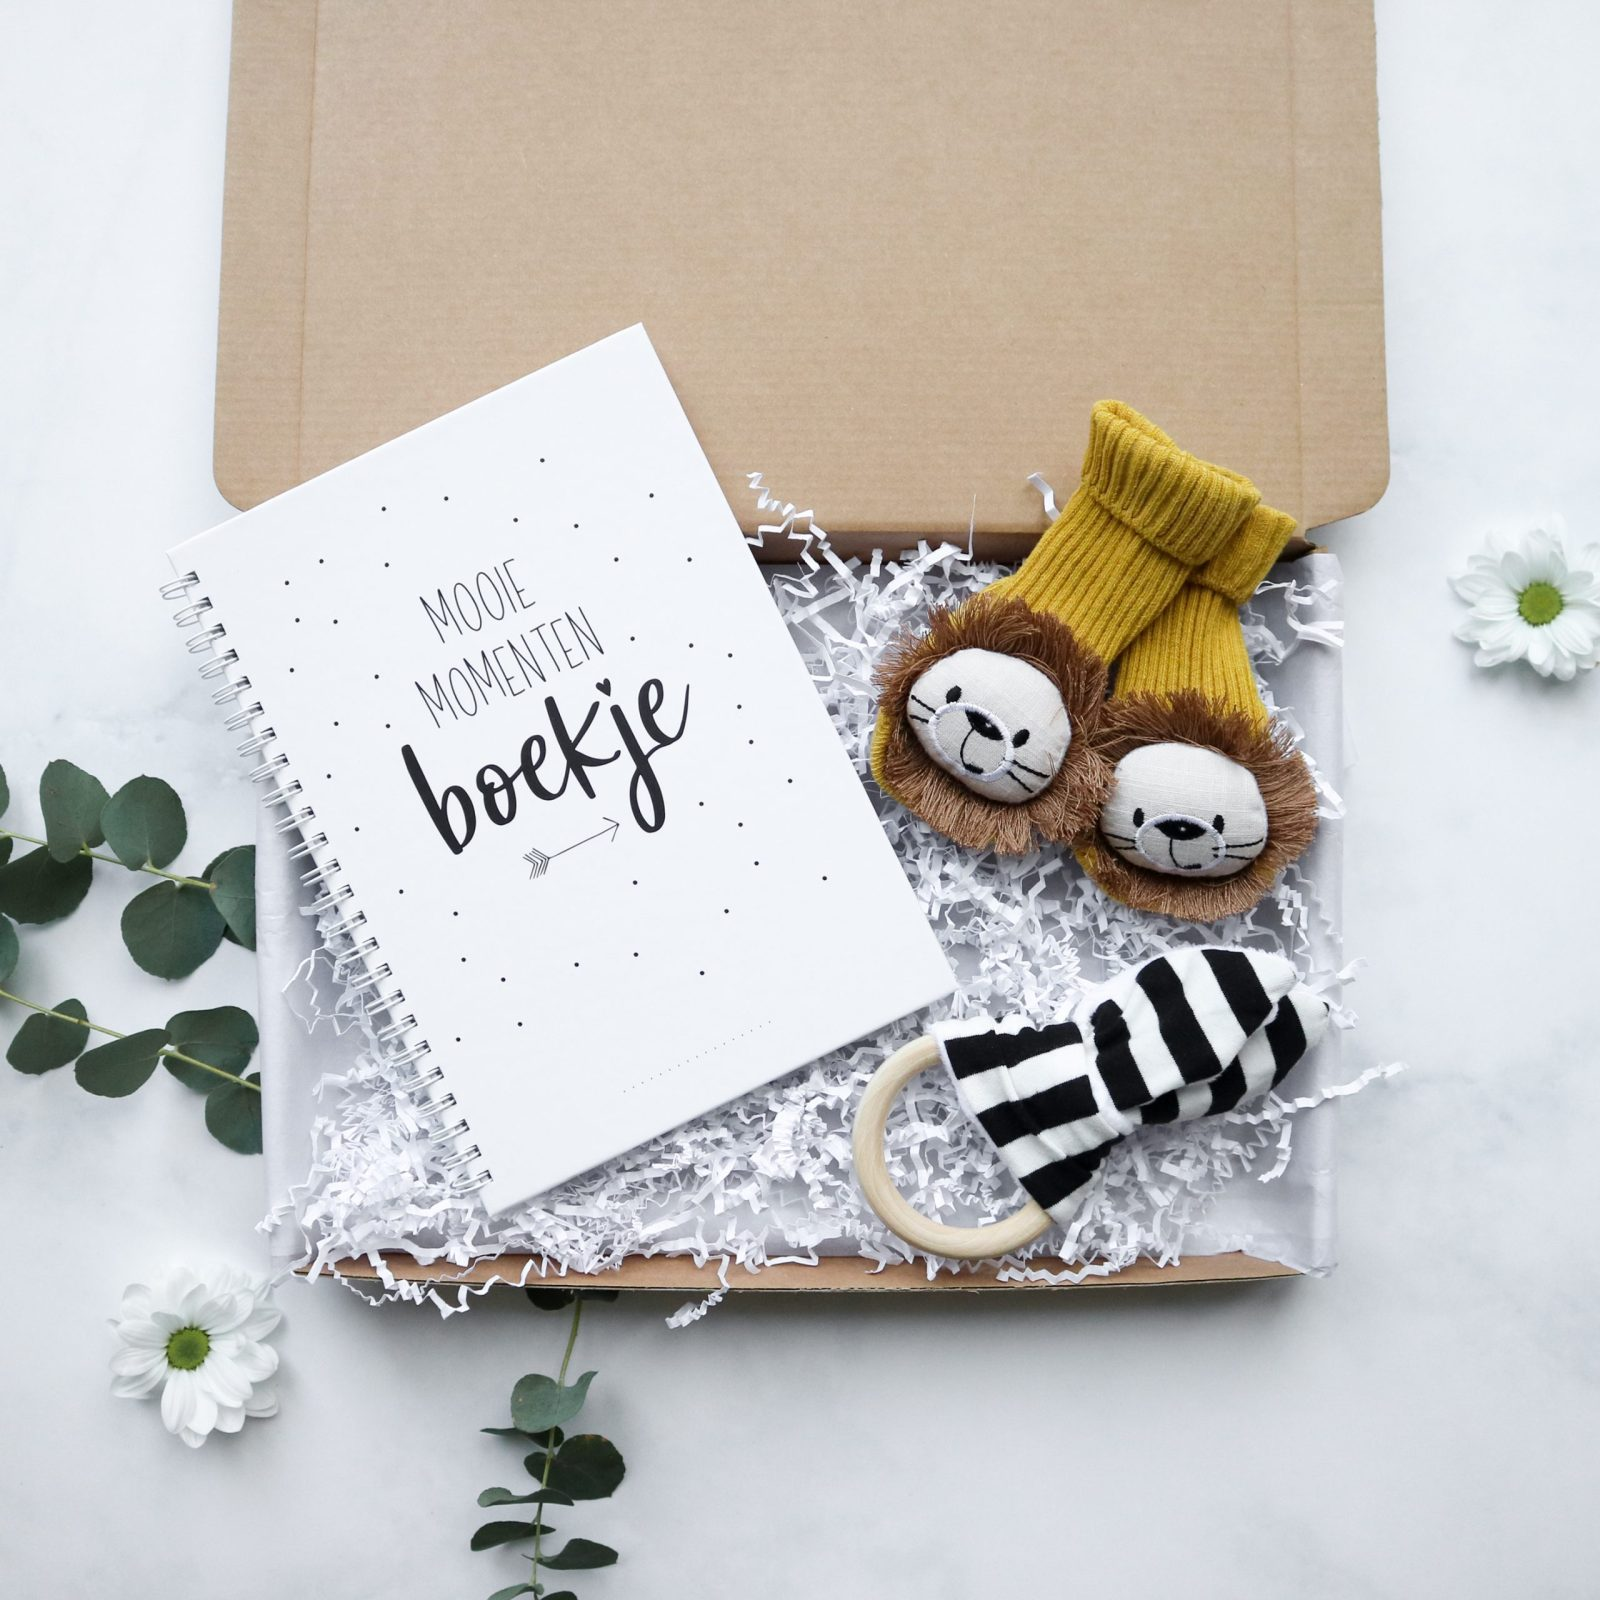 baby brievenbuscadeau, kraamcadeau brievenbus, mooie momenten boekje, origineel kraamcadeau, goedkoop kraamcadeau